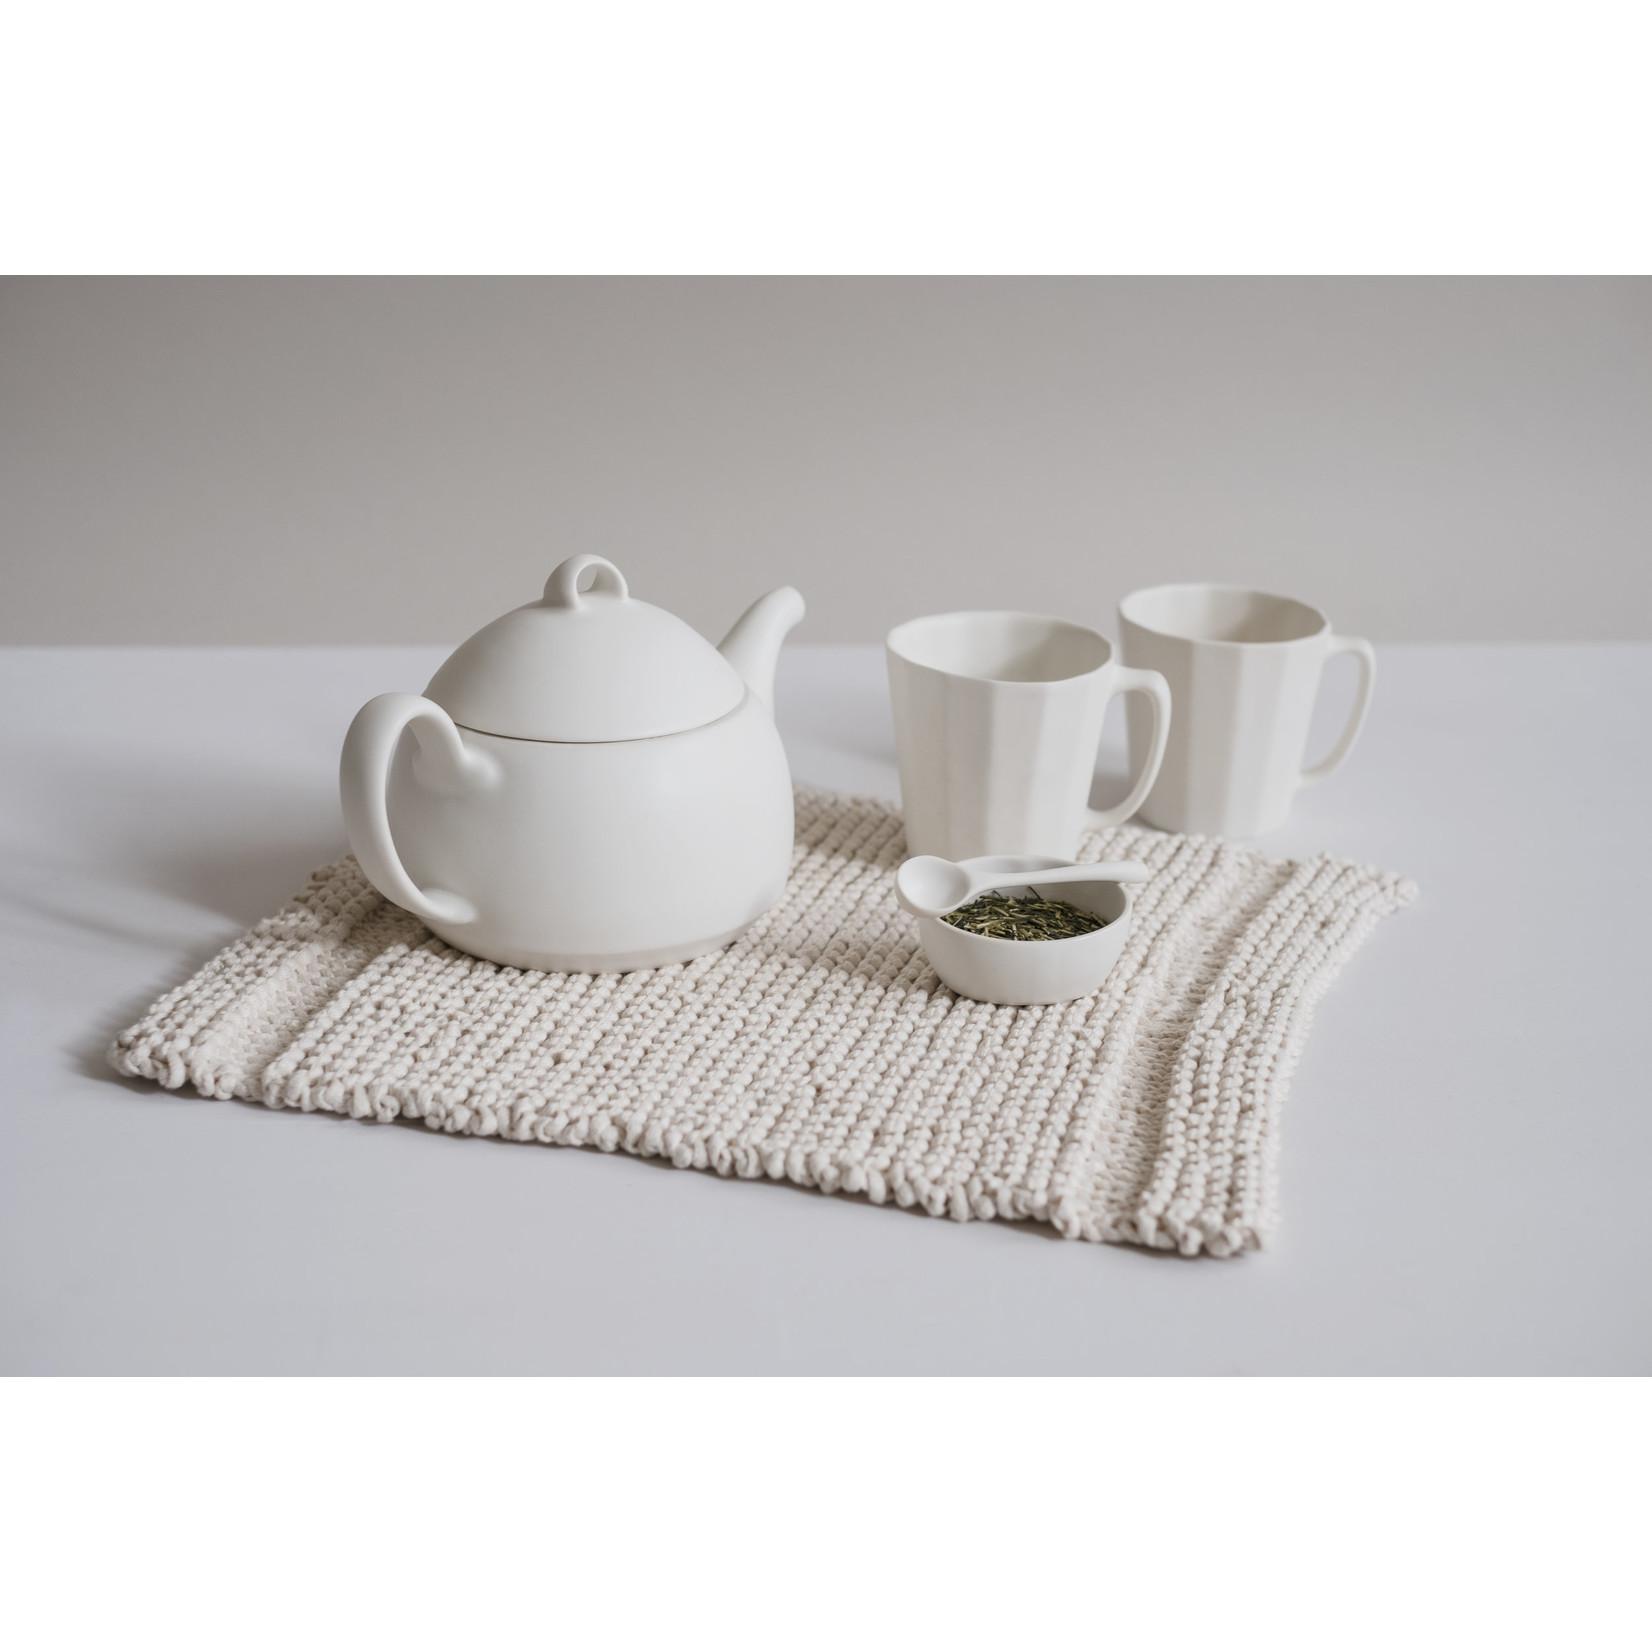 Echoview Fiber Mill Natural: Table Mat Knit Kit